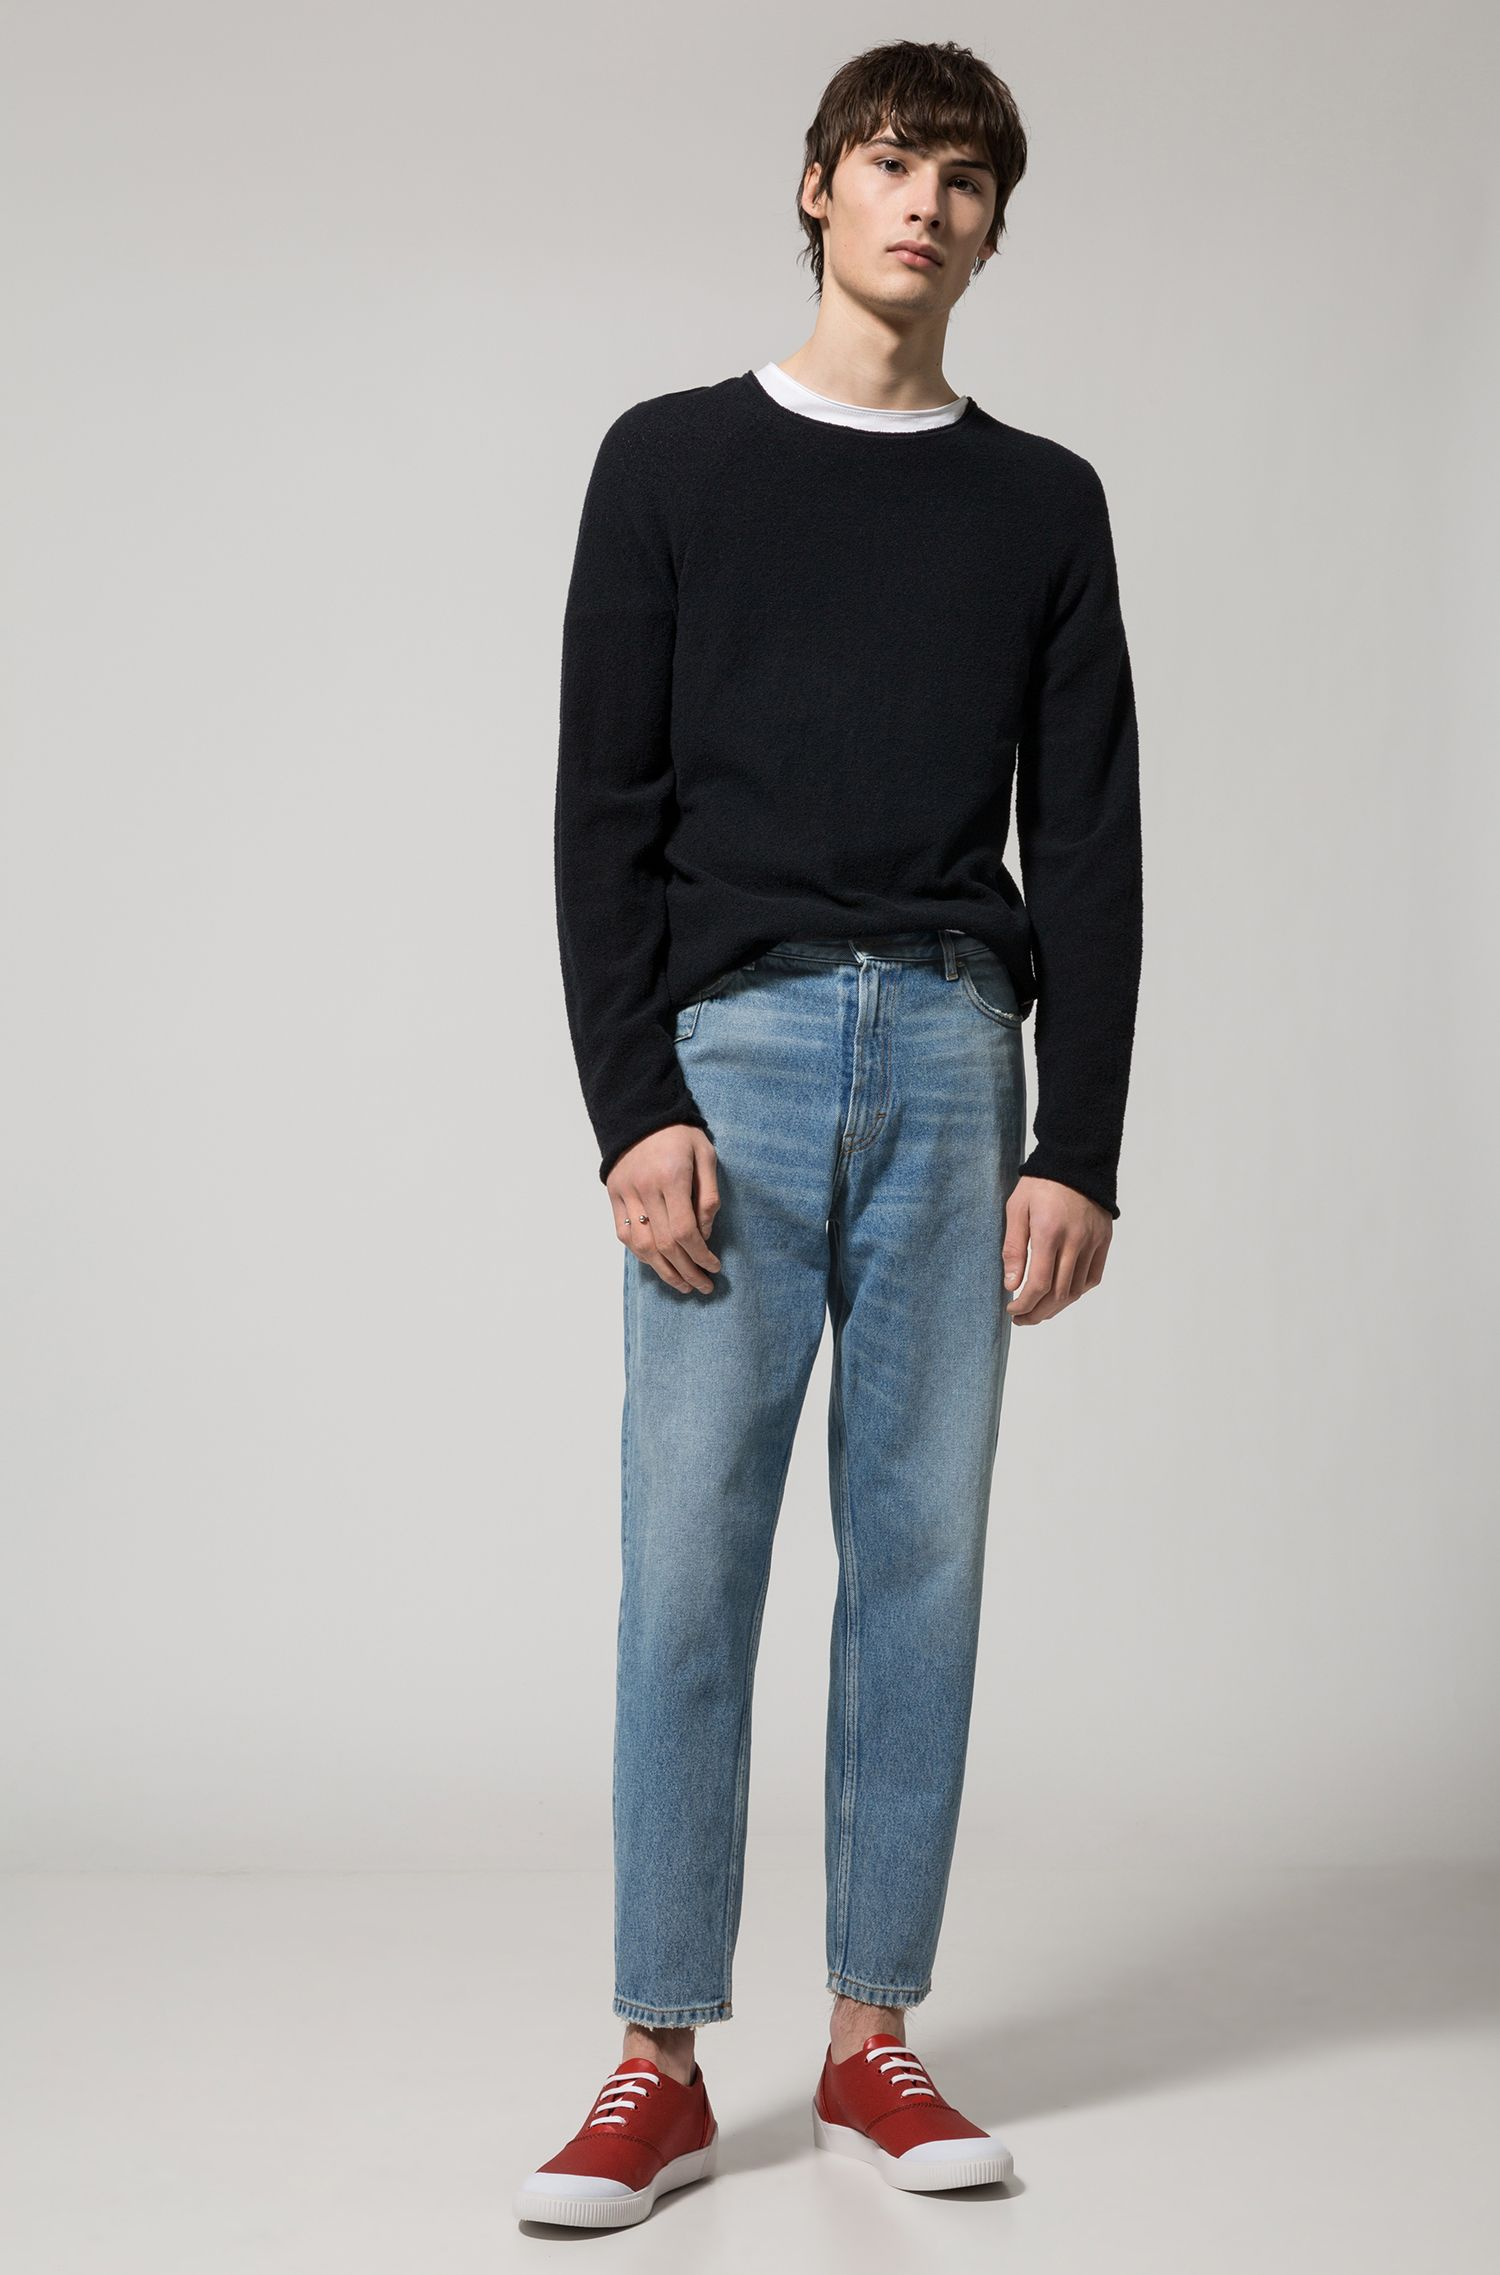 Cotton Blend Boucle Sweater | Solerino , Black